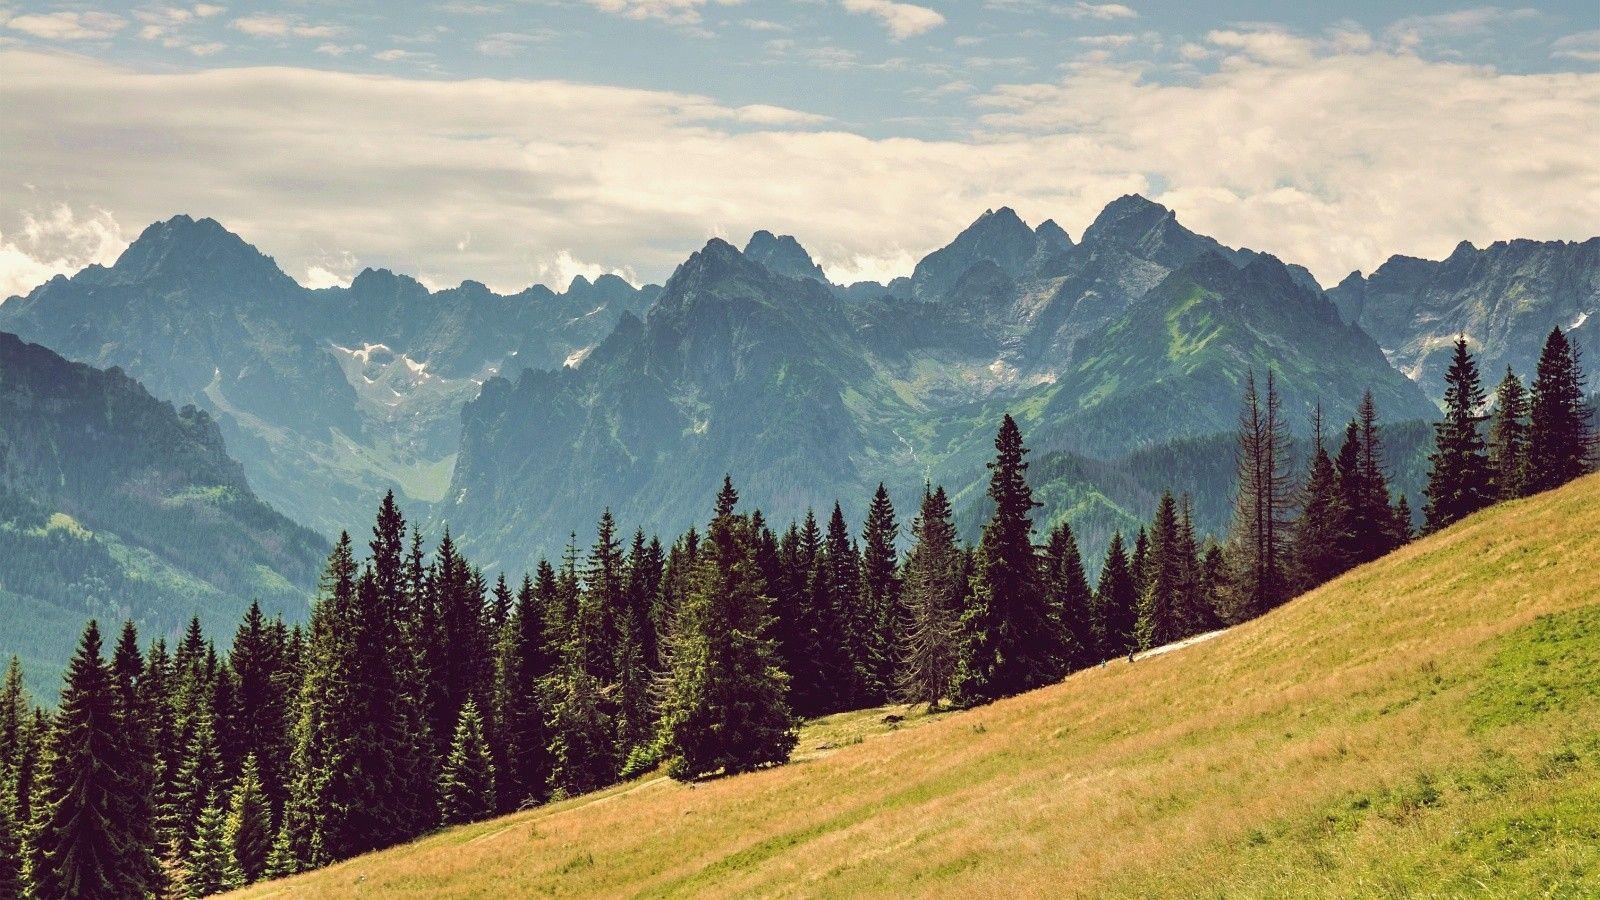 landscape pic pine trees - Google Search